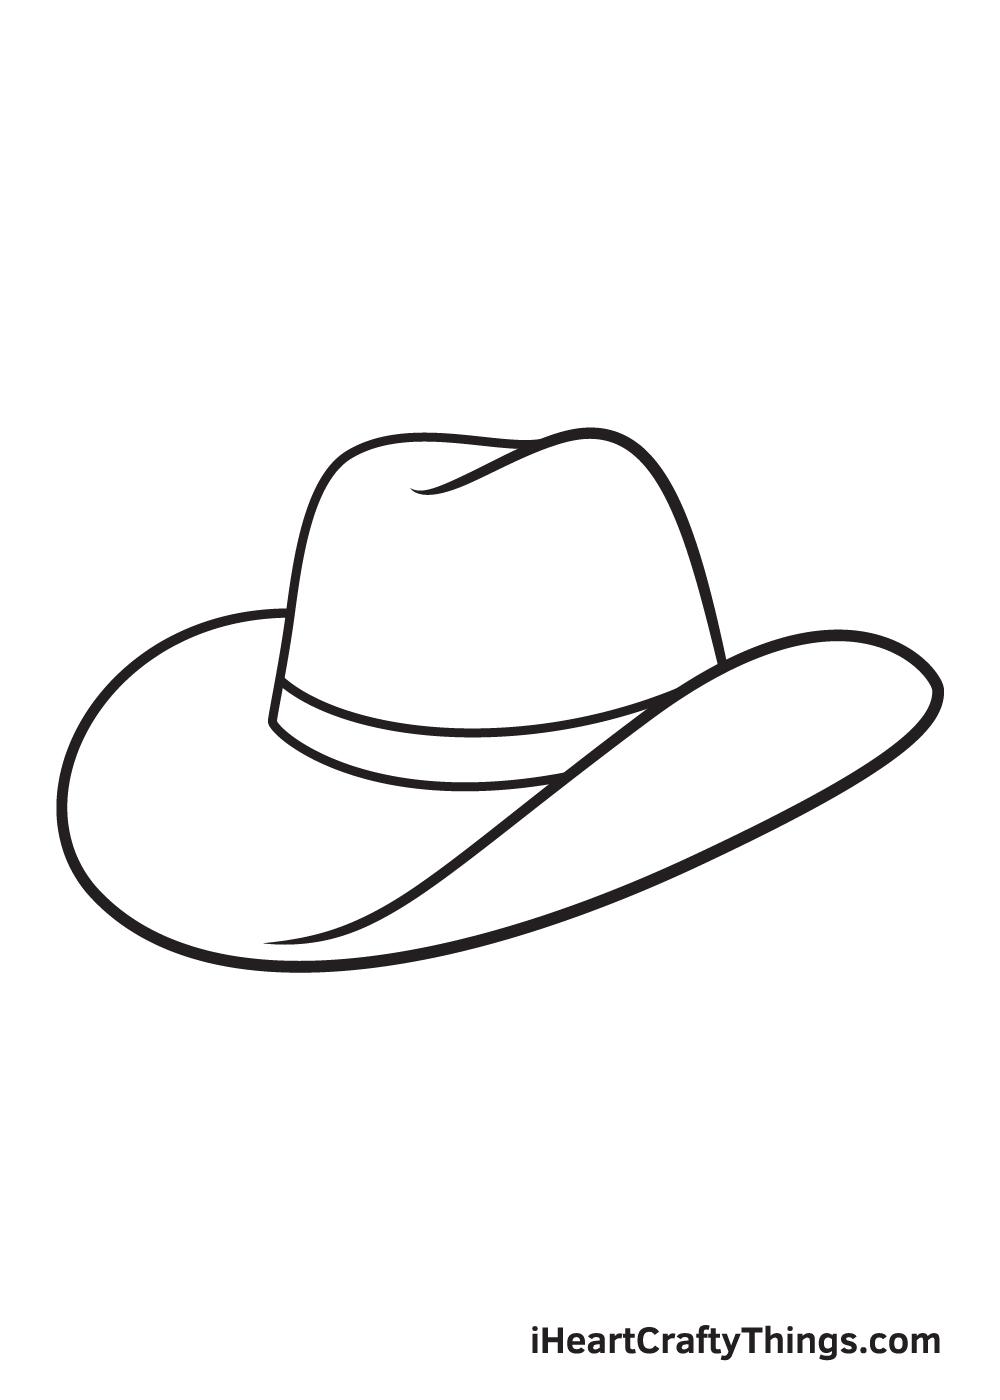 cowboy hat drawing - step 7